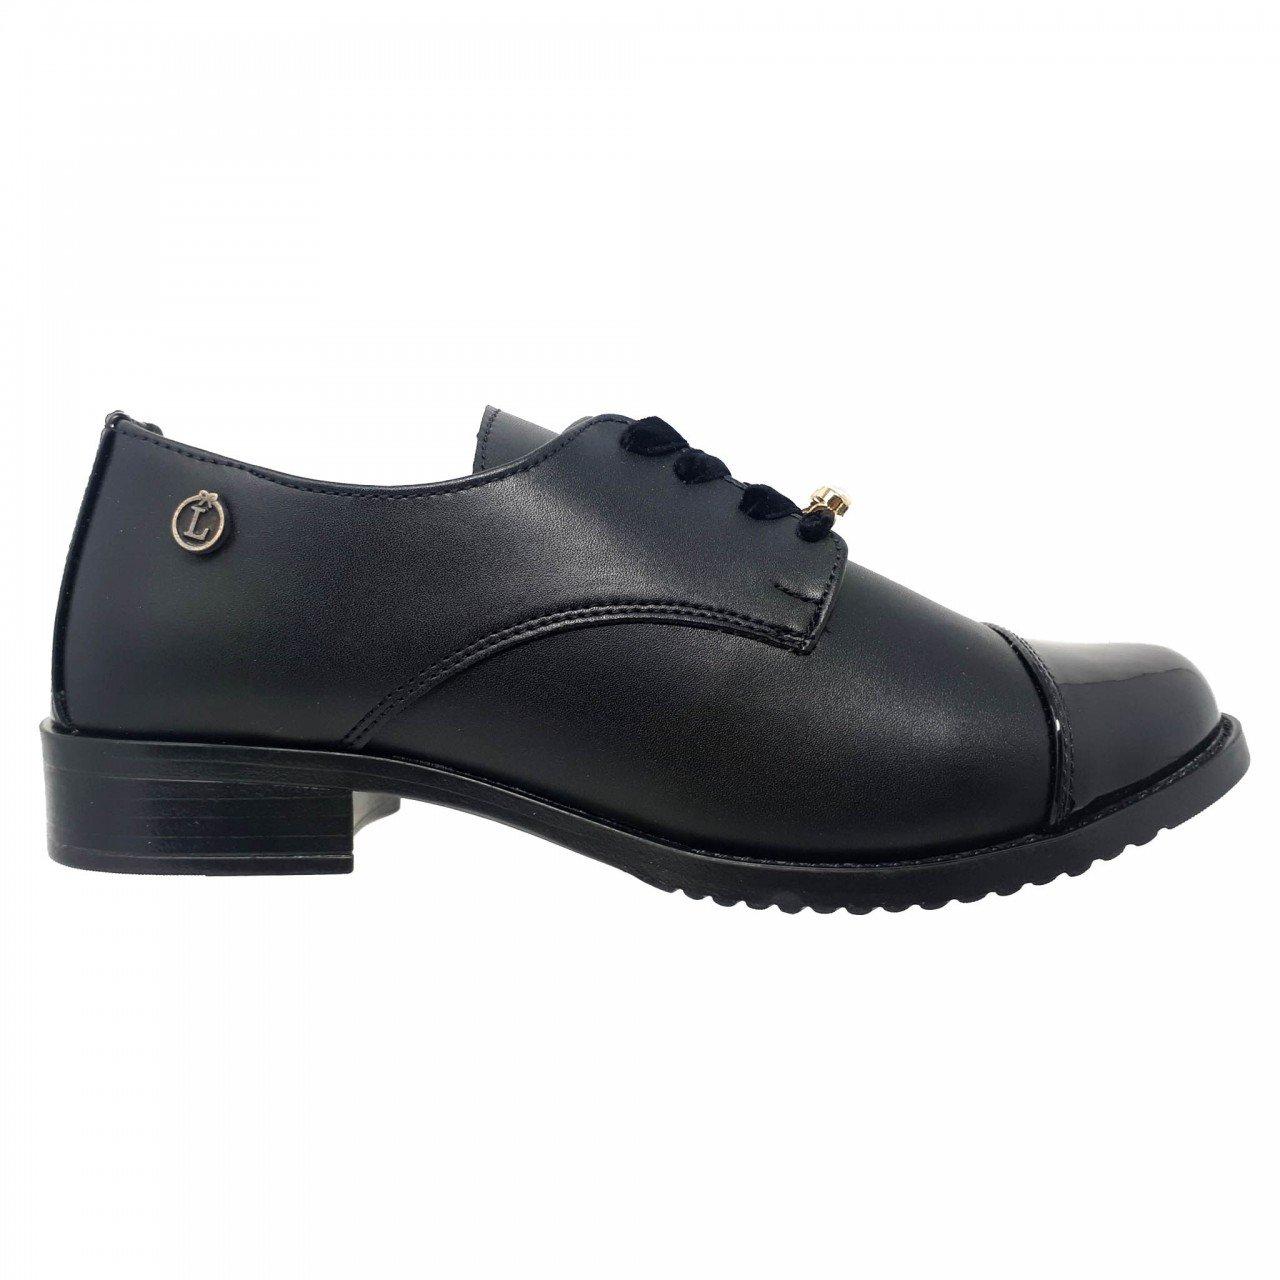 Zapato negro para mujer Nora Loly in the sky